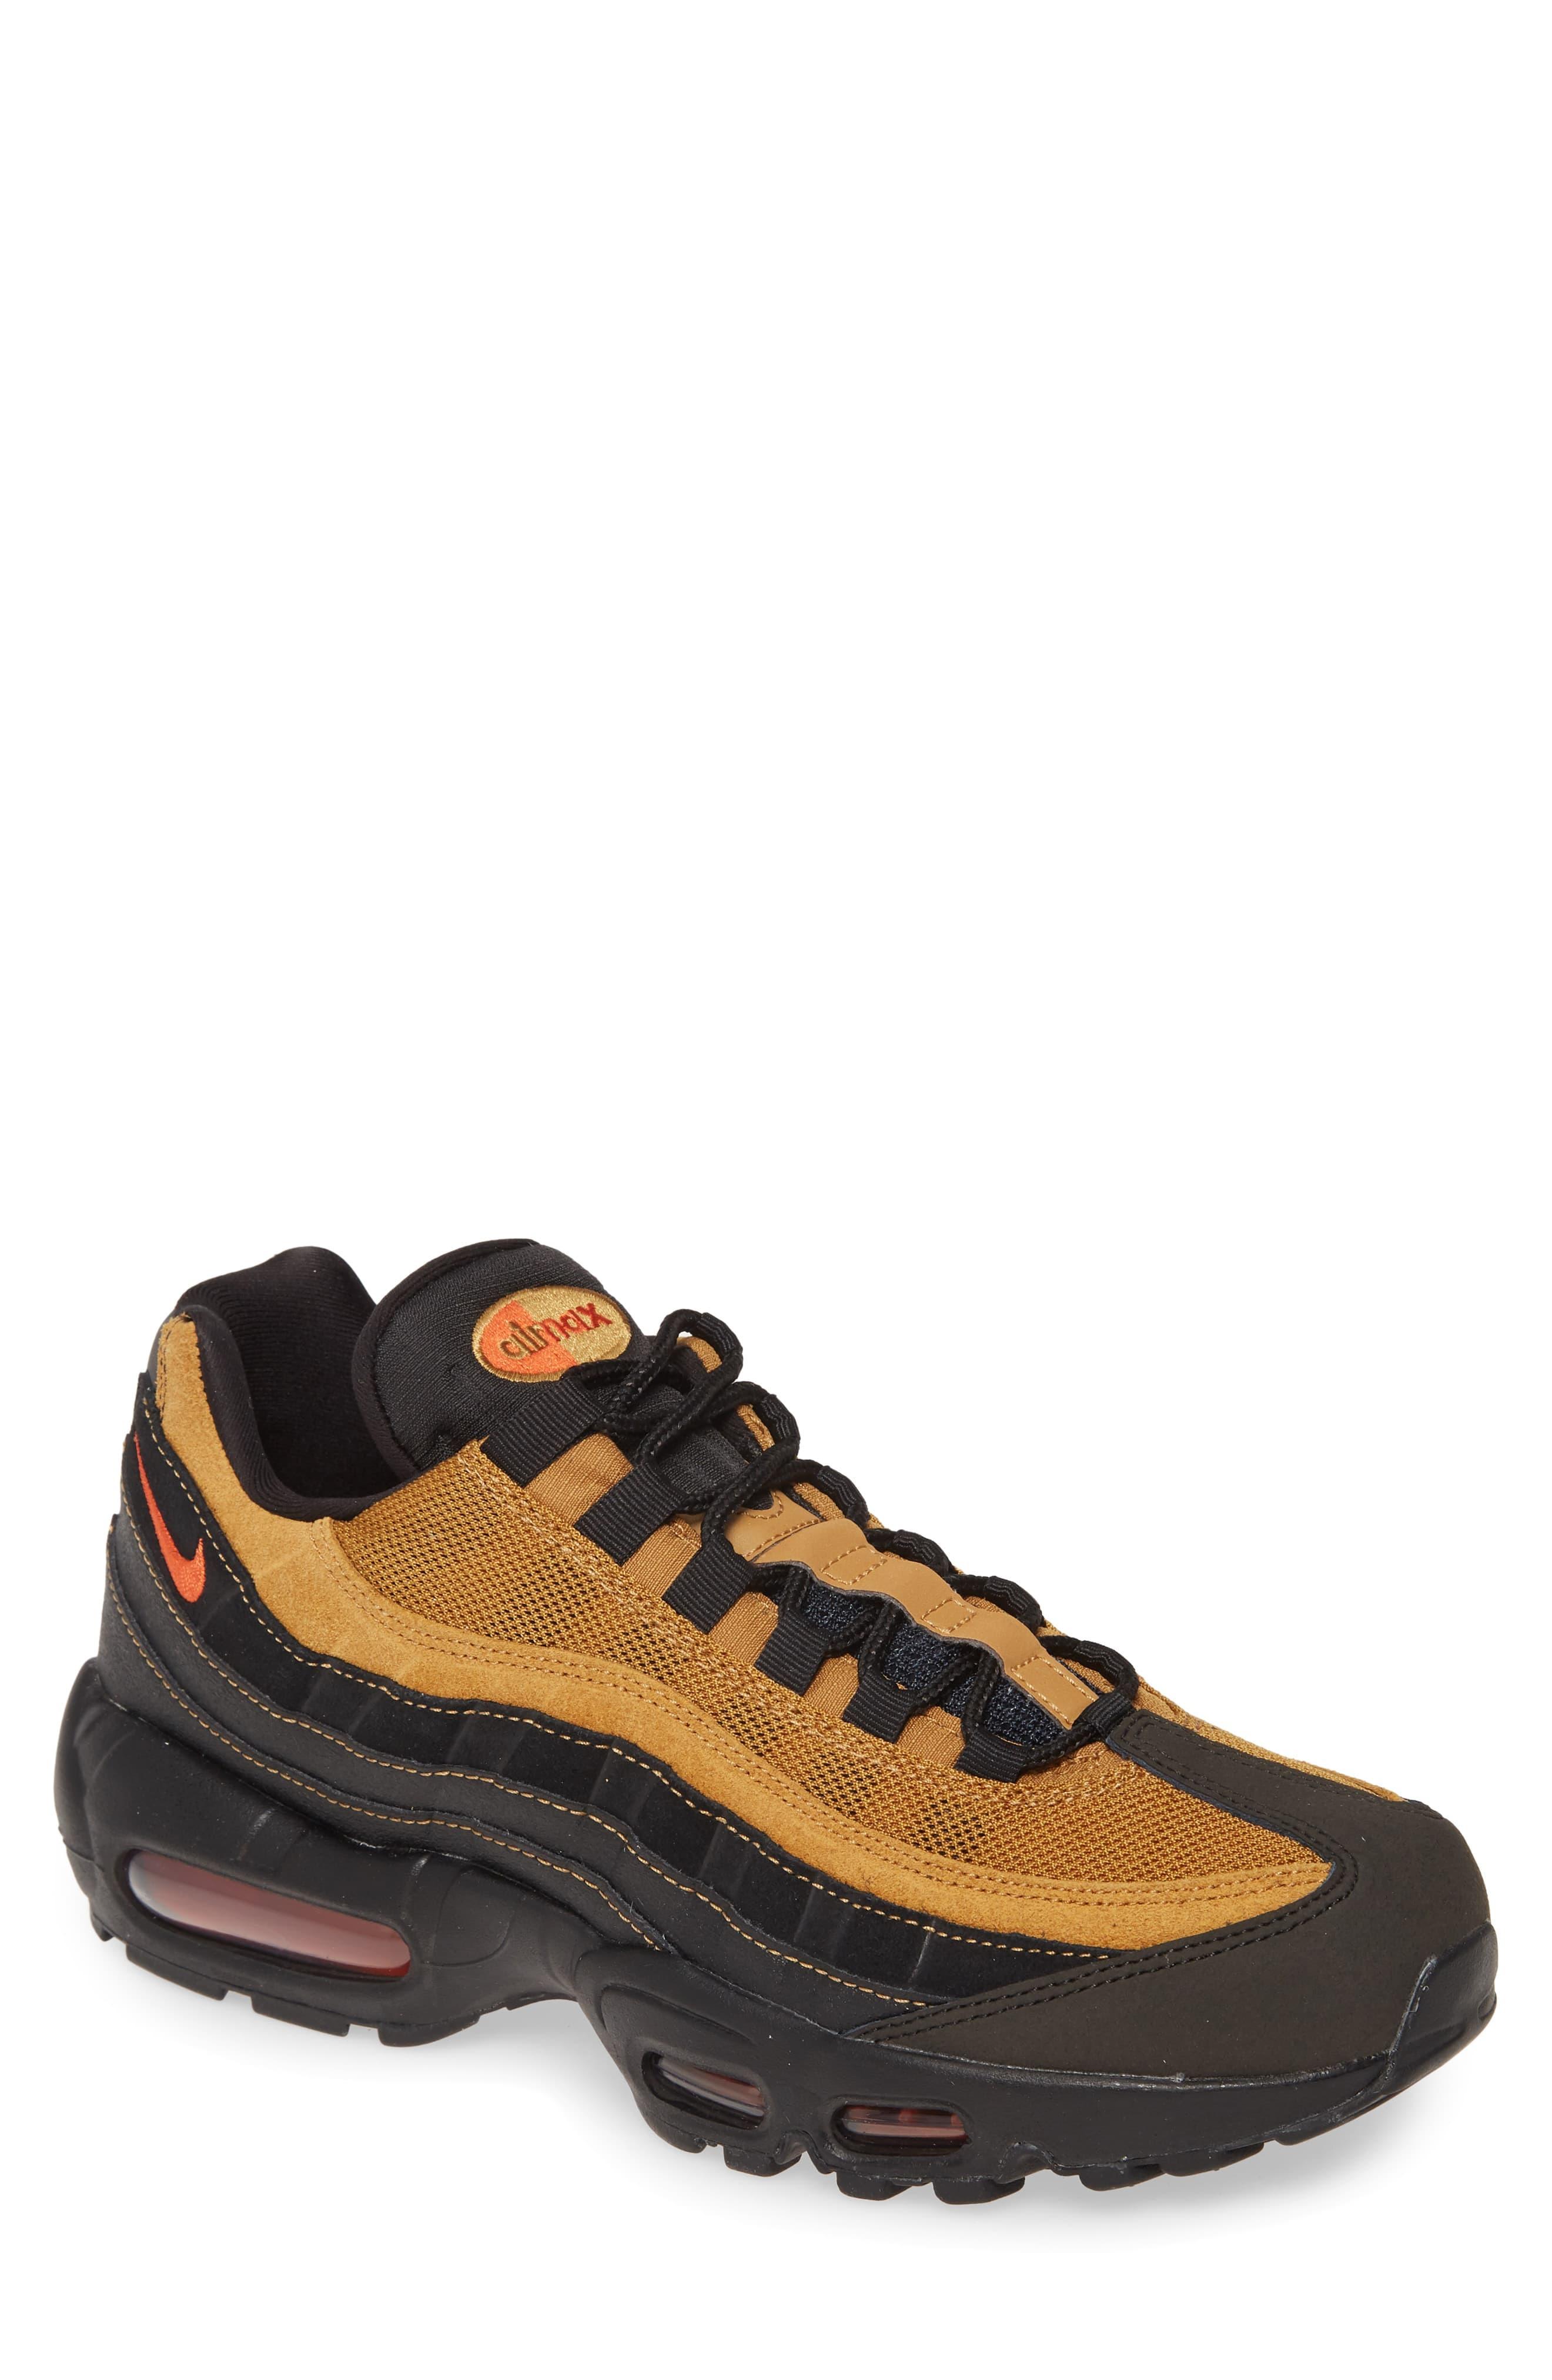 Nike Air Max 95 Essential Sneaker, $79